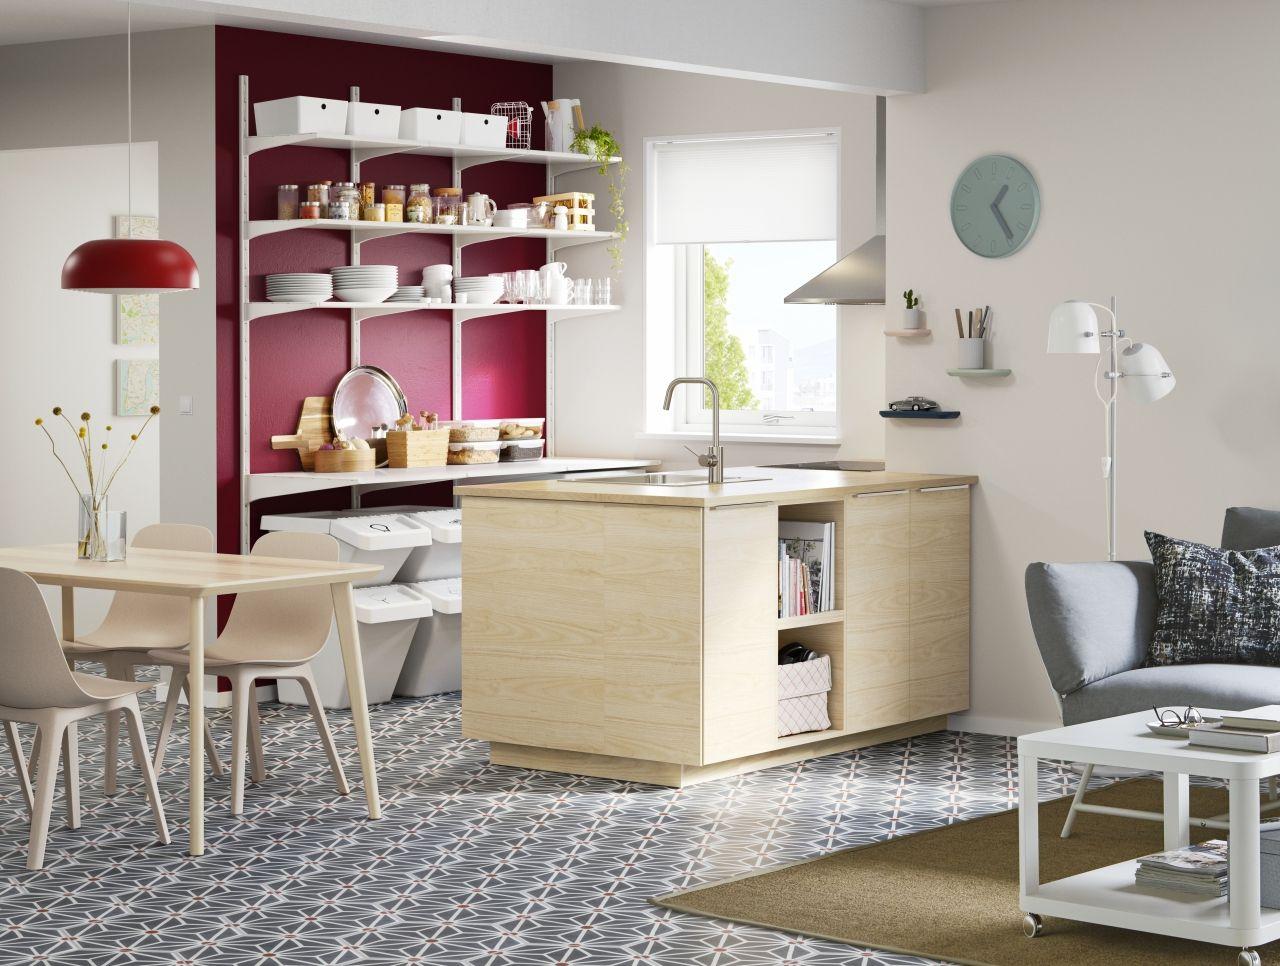 METOD/ASKERSUND, cucina completa | IKEA CUCINE | Pinterest | Kitchen ...